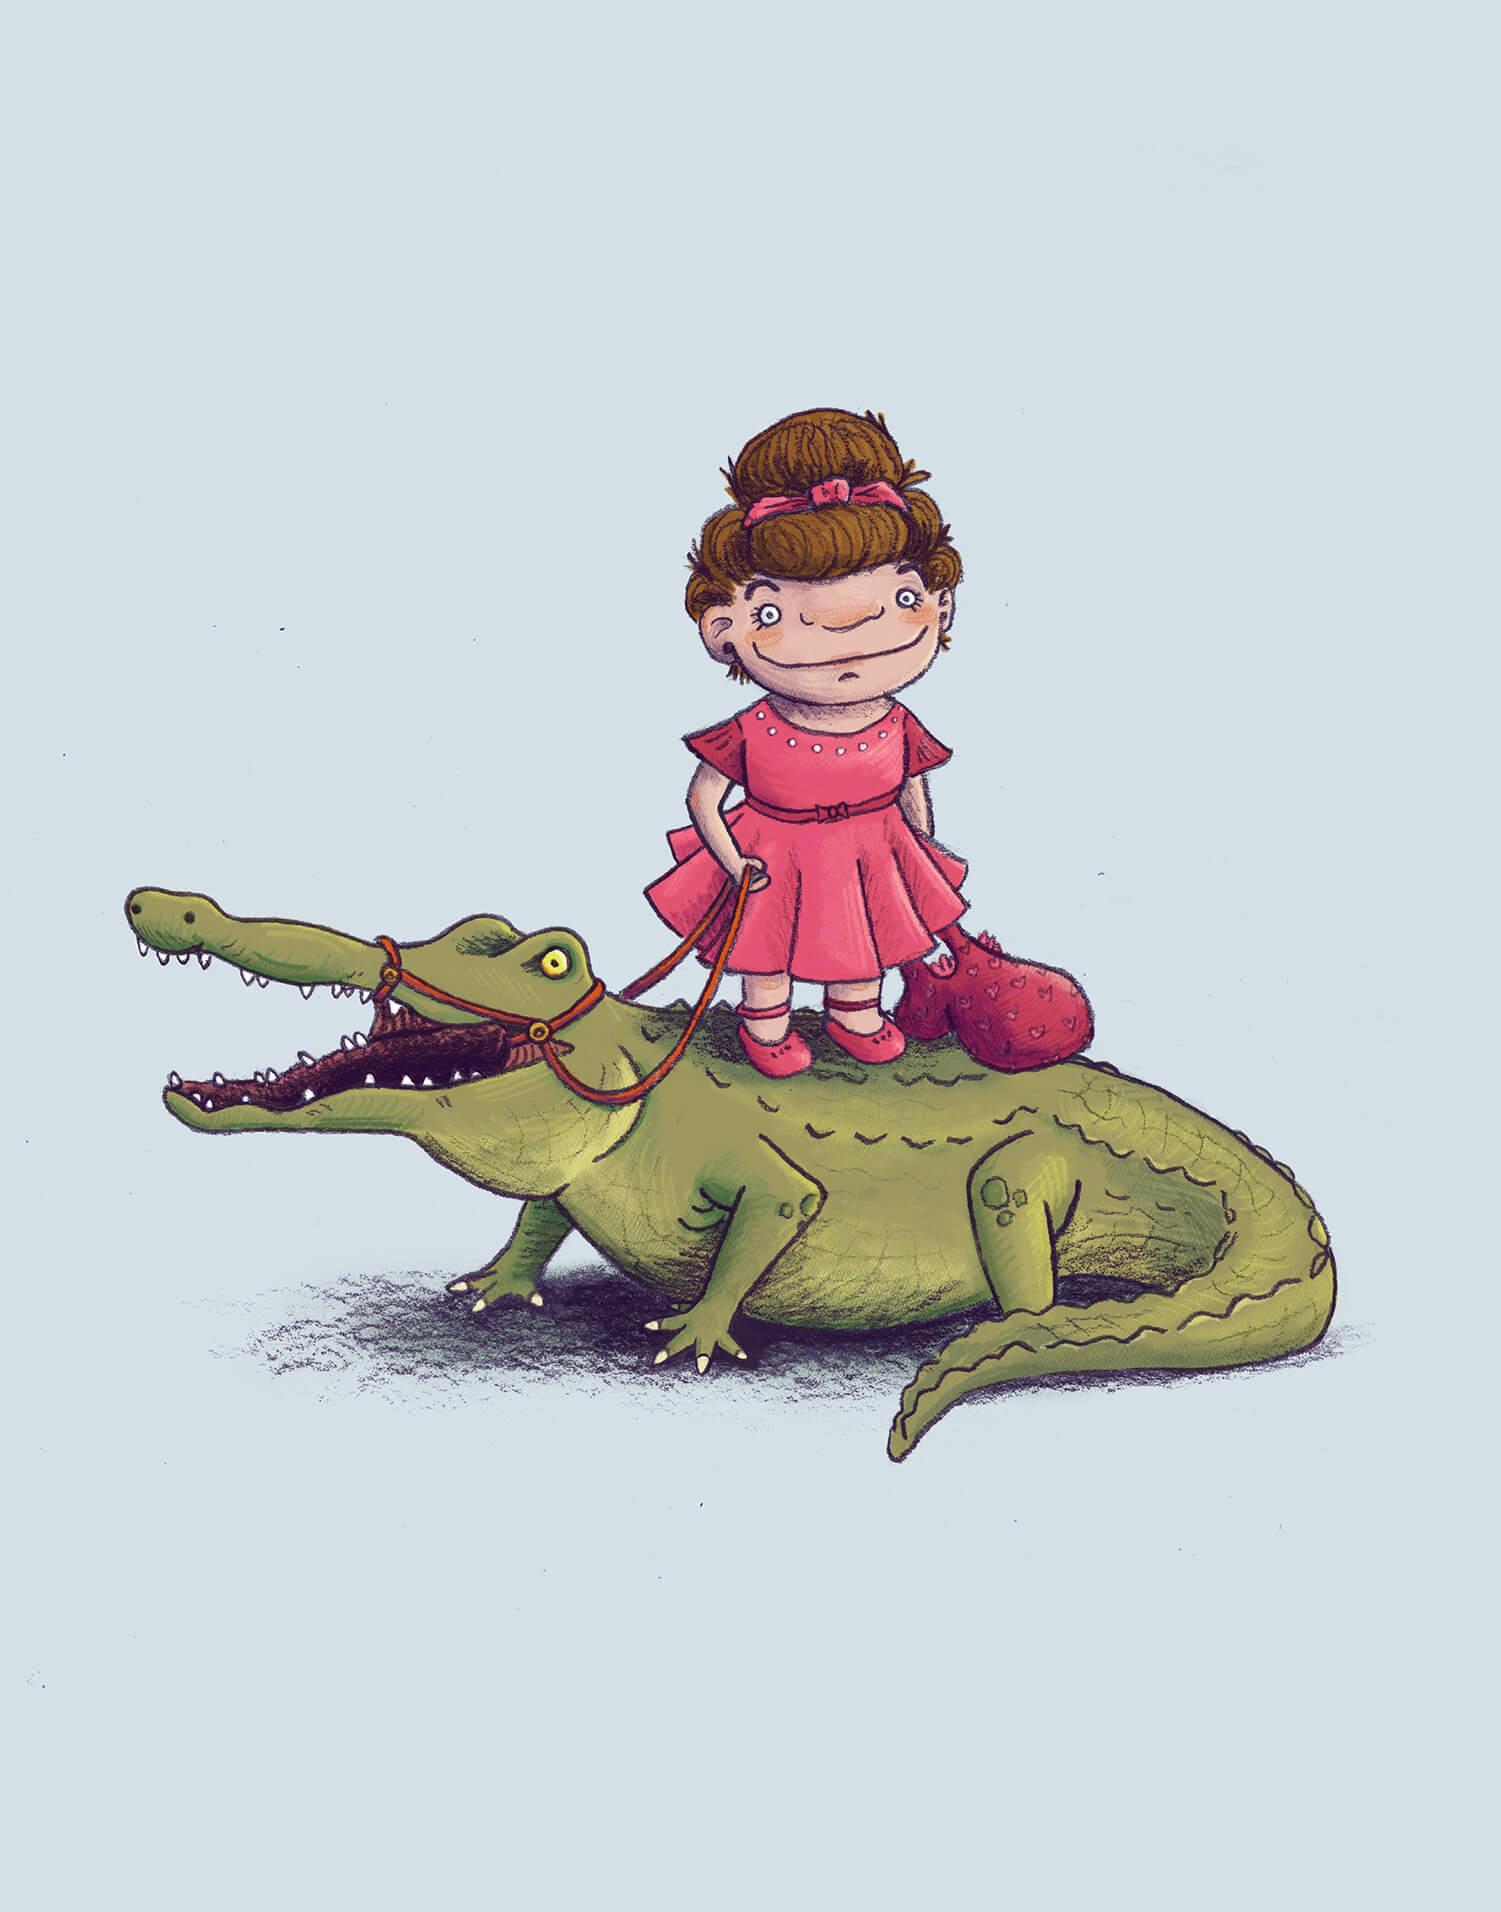 whimsical children's illustration of a child dancer and her pet alligator